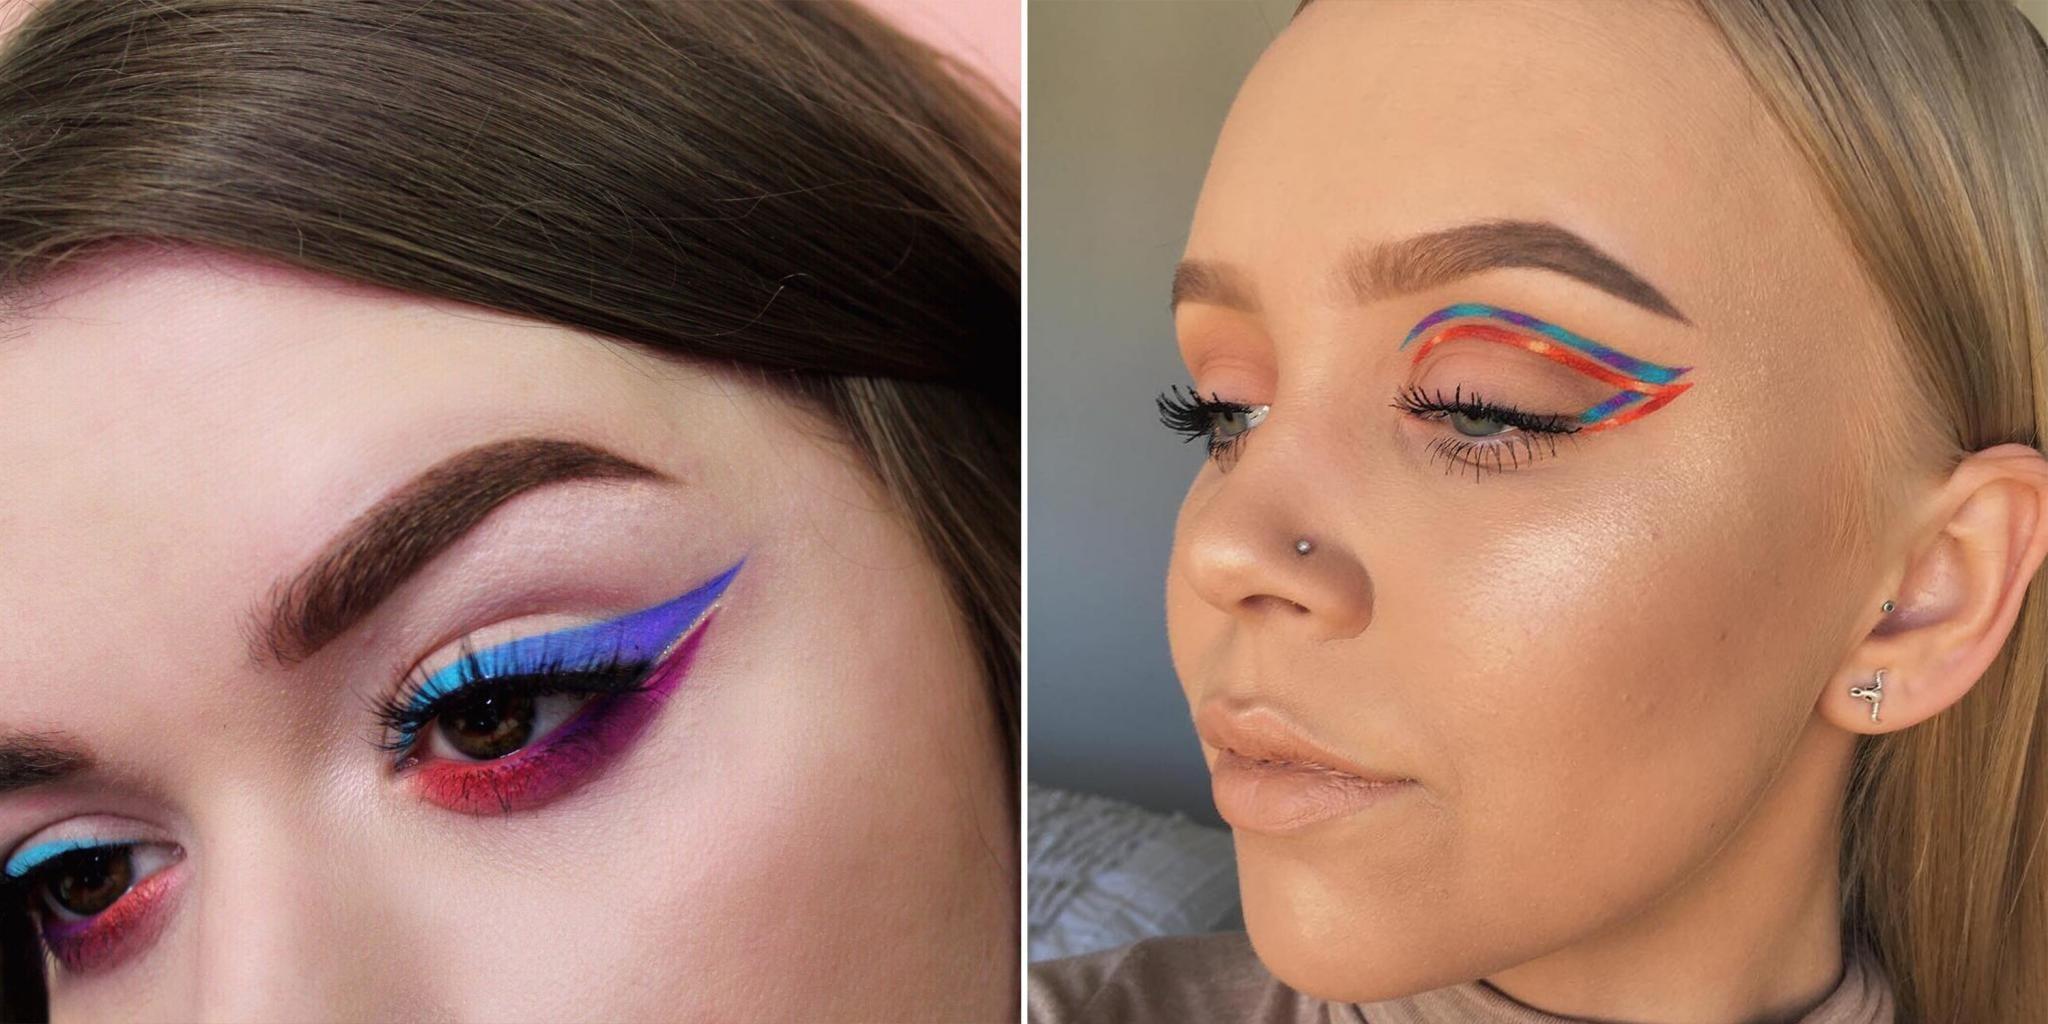 The New Ombré Eyeliner Technique Is Taking Over Instagram